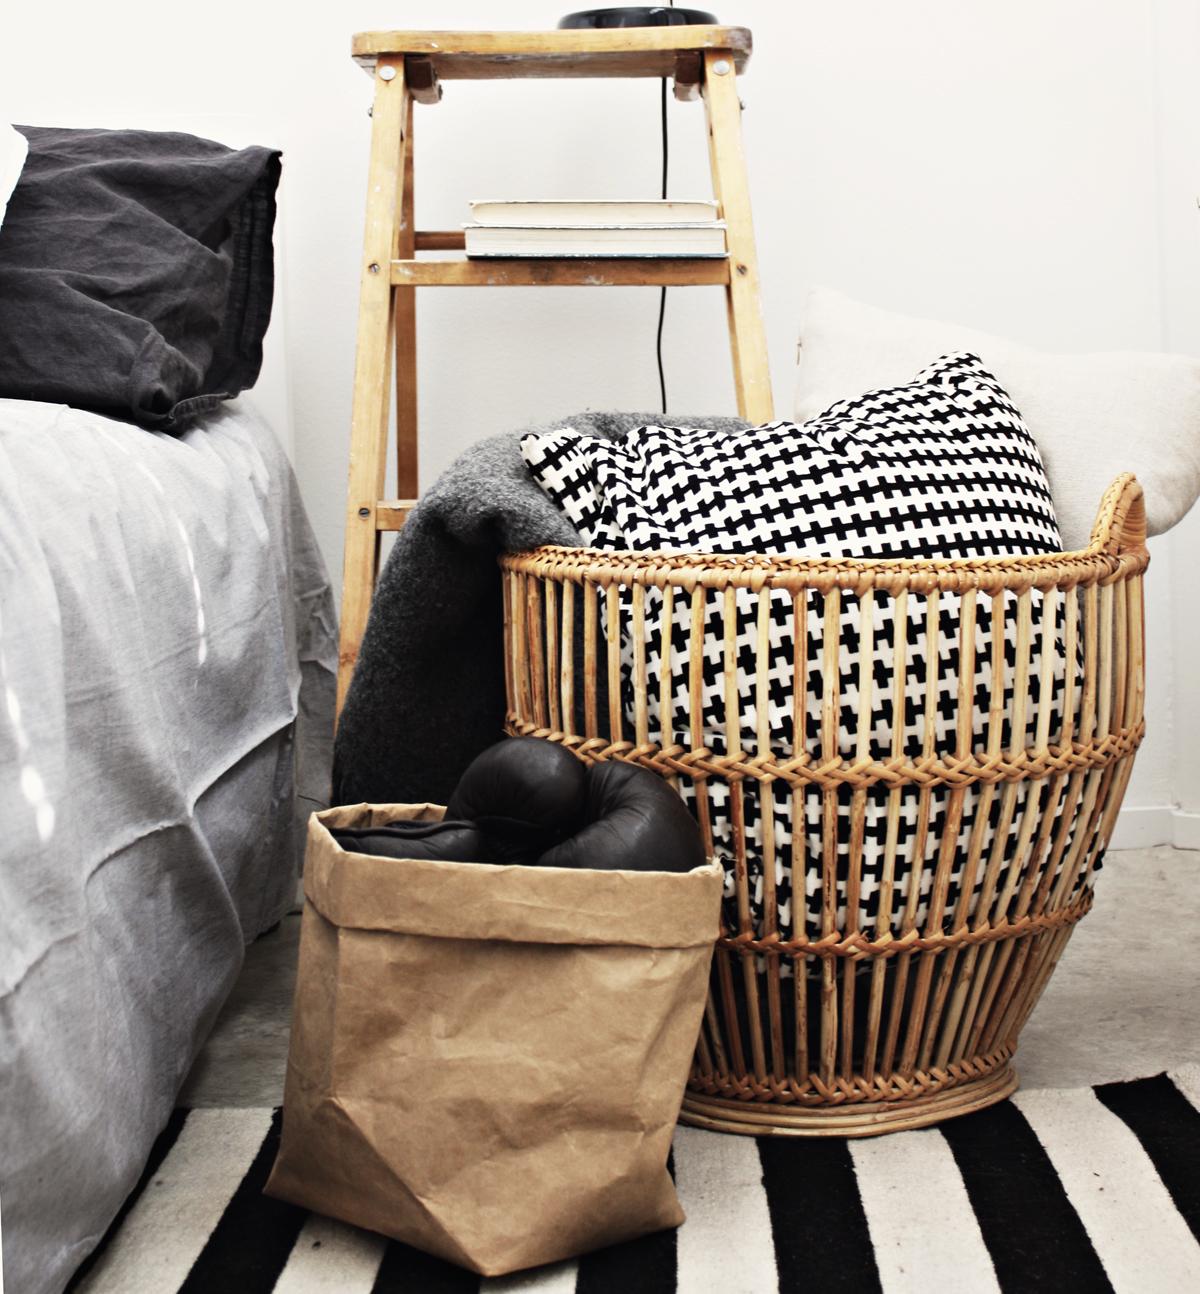 baskets_038.jpg